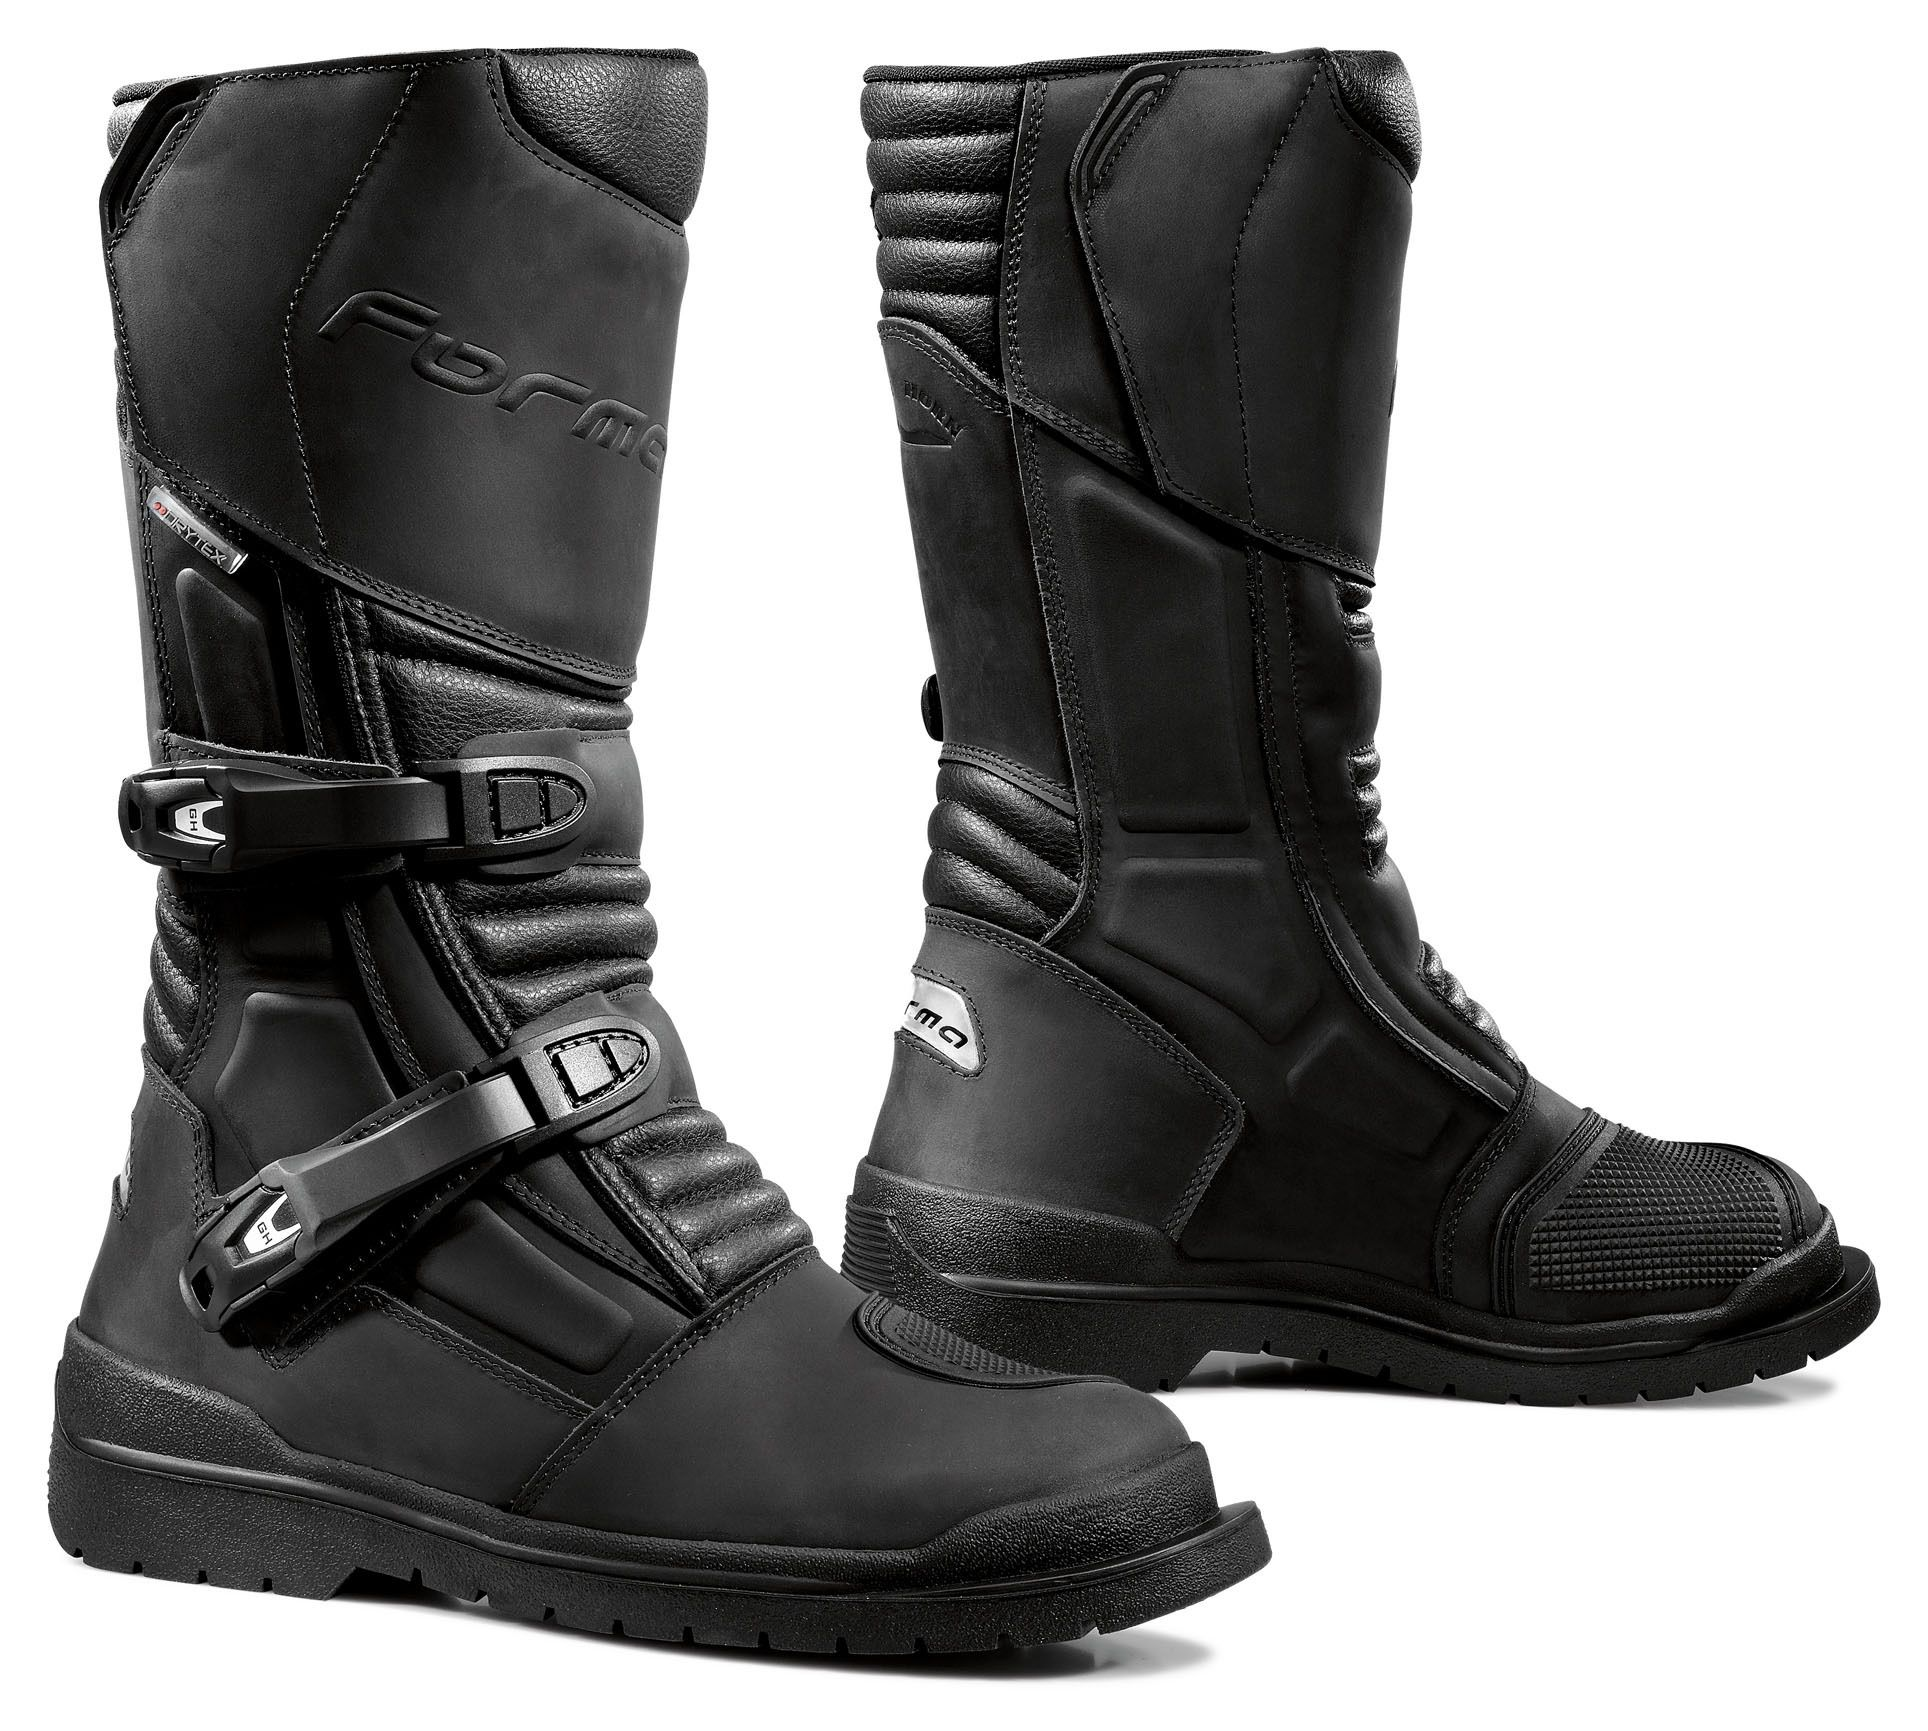 forma cape horn boots revzilla. Black Bedroom Furniture Sets. Home Design Ideas